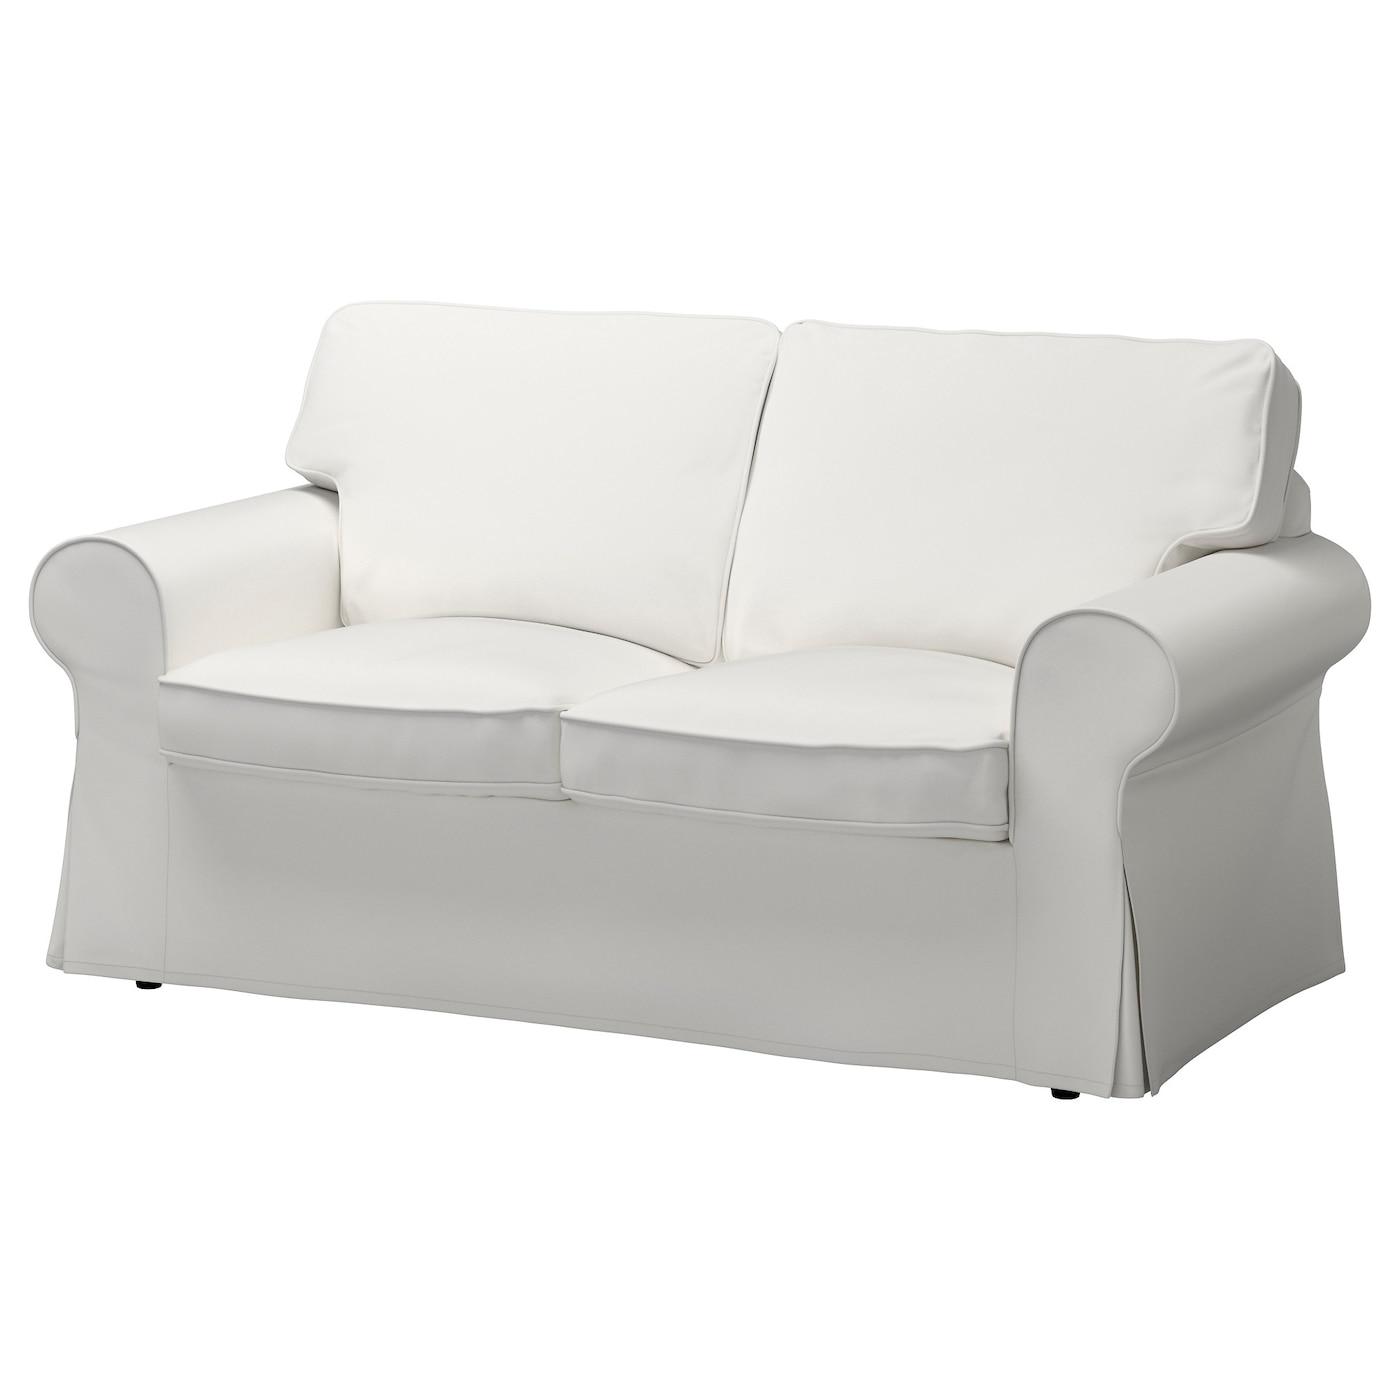 ektorp housse de canap 2pla vittaryd blanc ikea. Black Bedroom Furniture Sets. Home Design Ideas